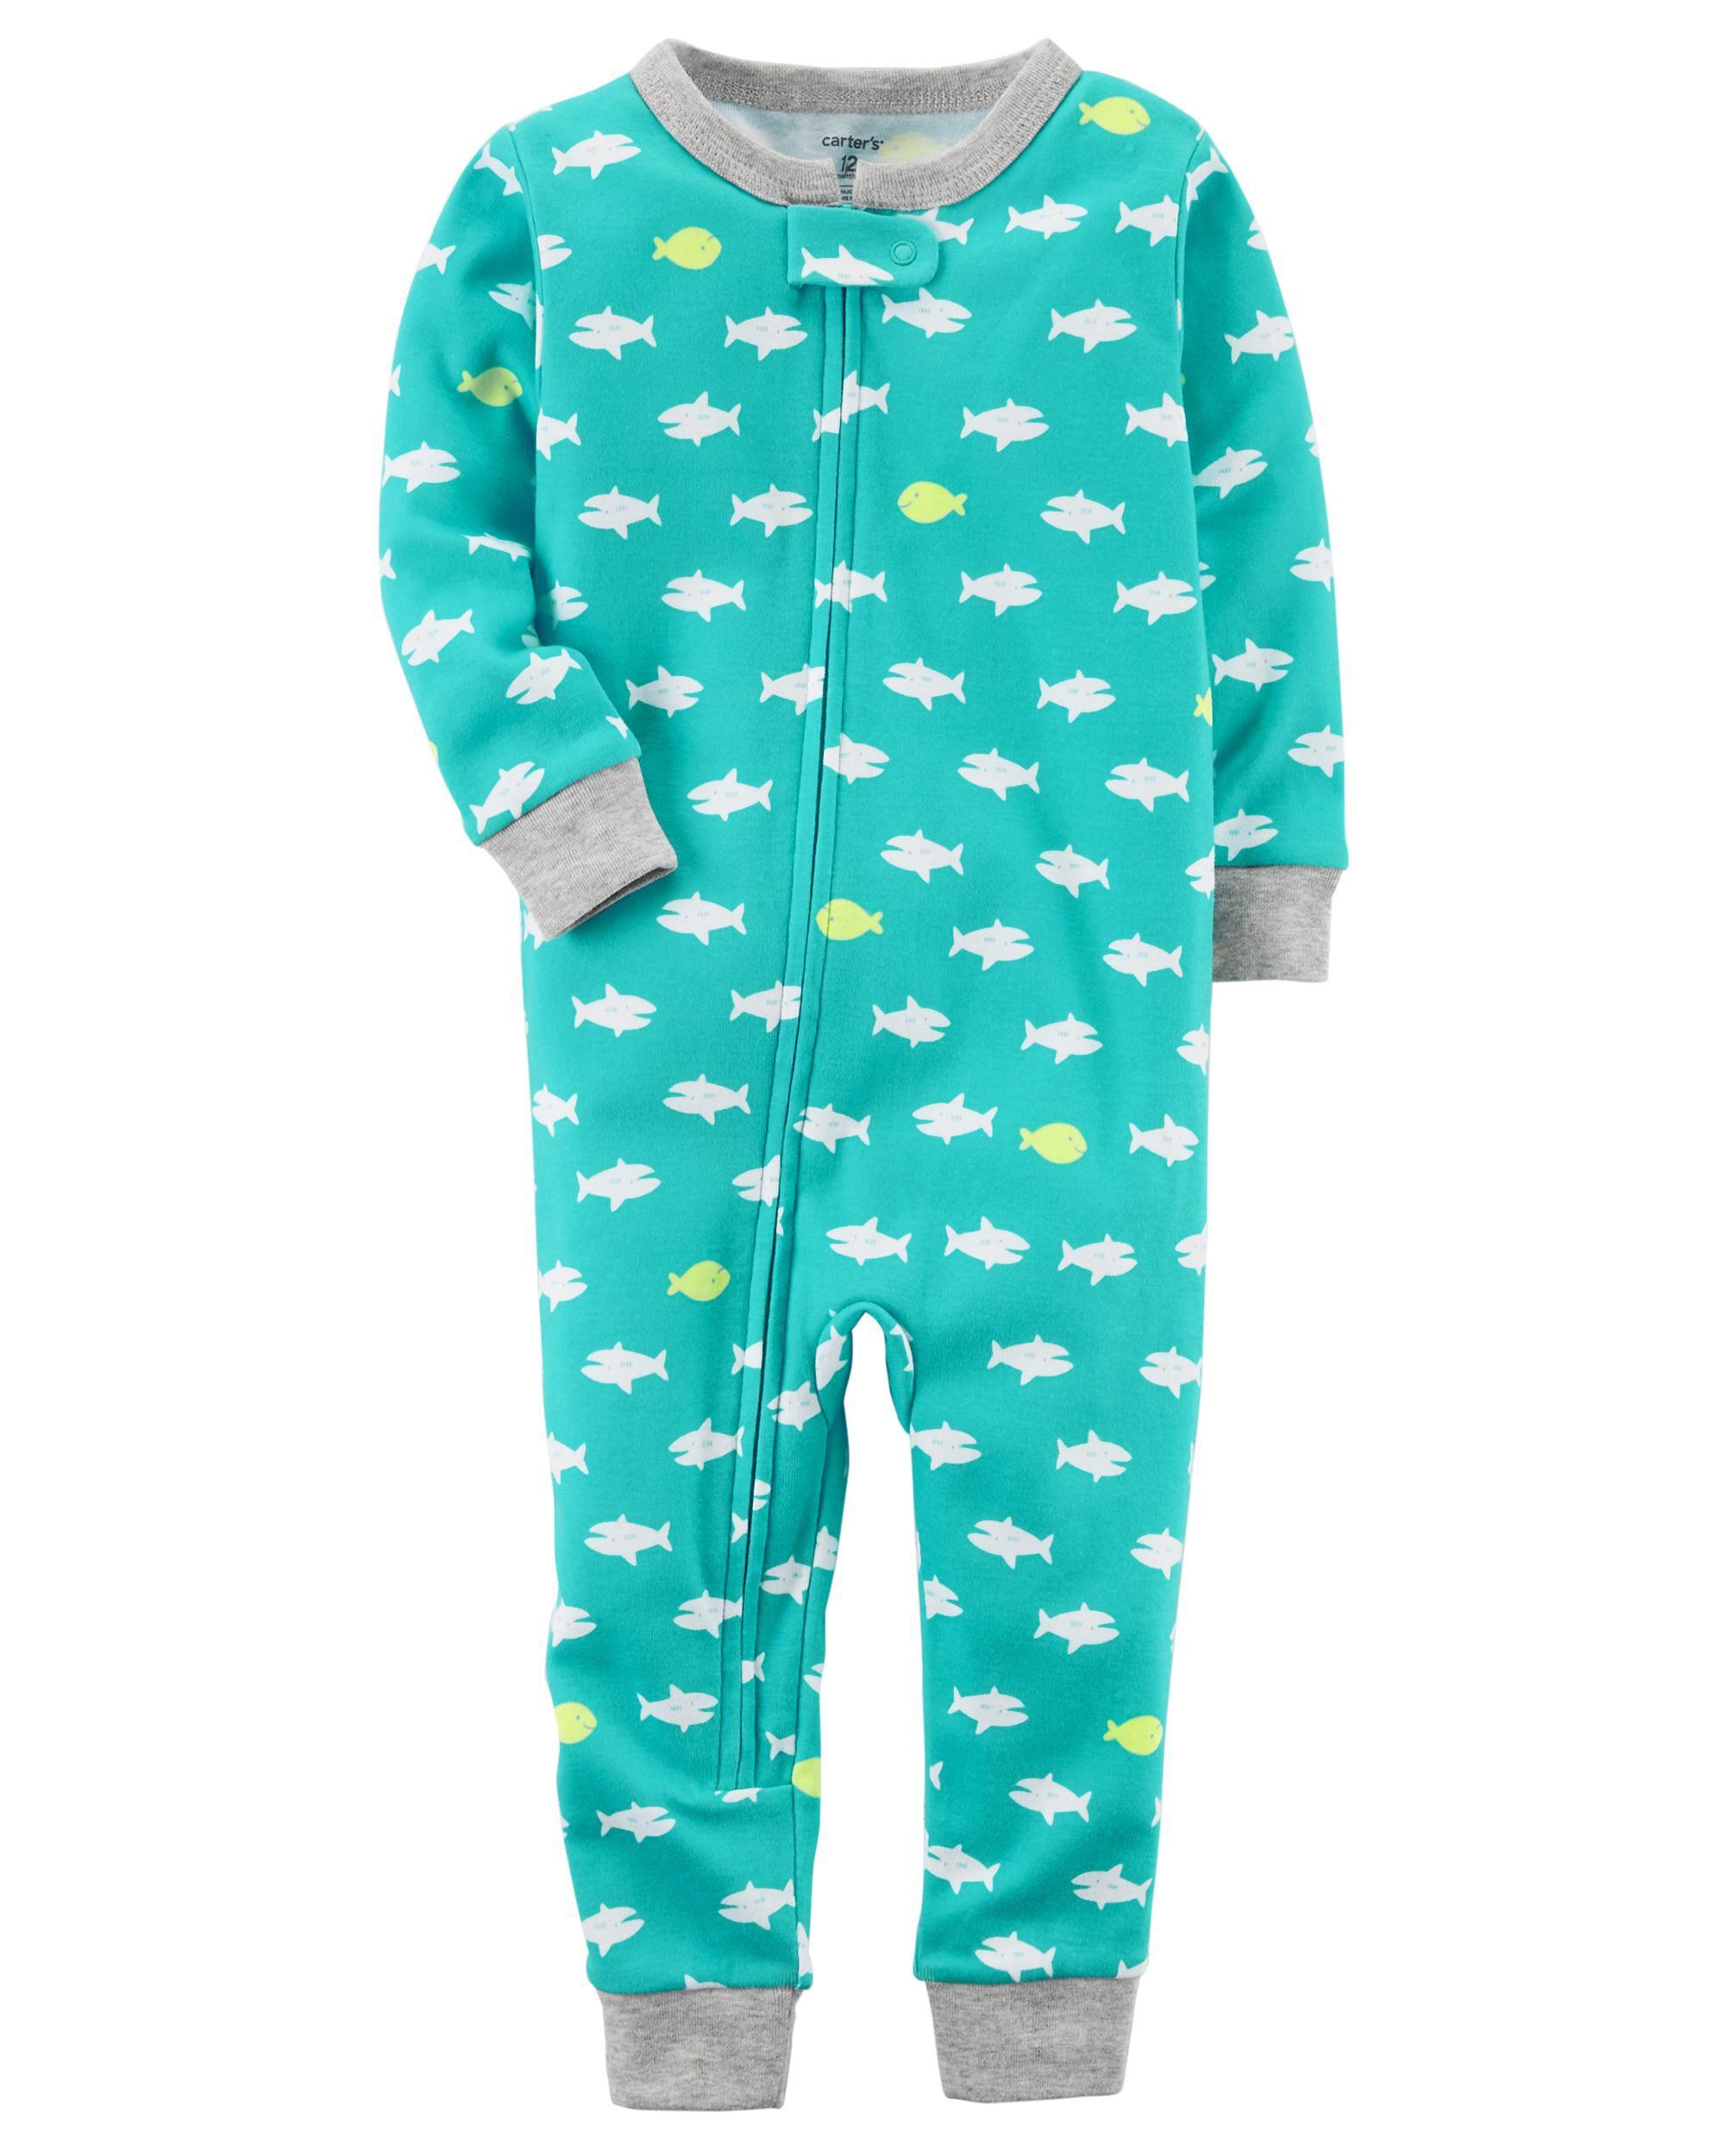 toddler boy pajamas sleepwear carter s shipping 1 piece neon snug fit cotton footless pjs